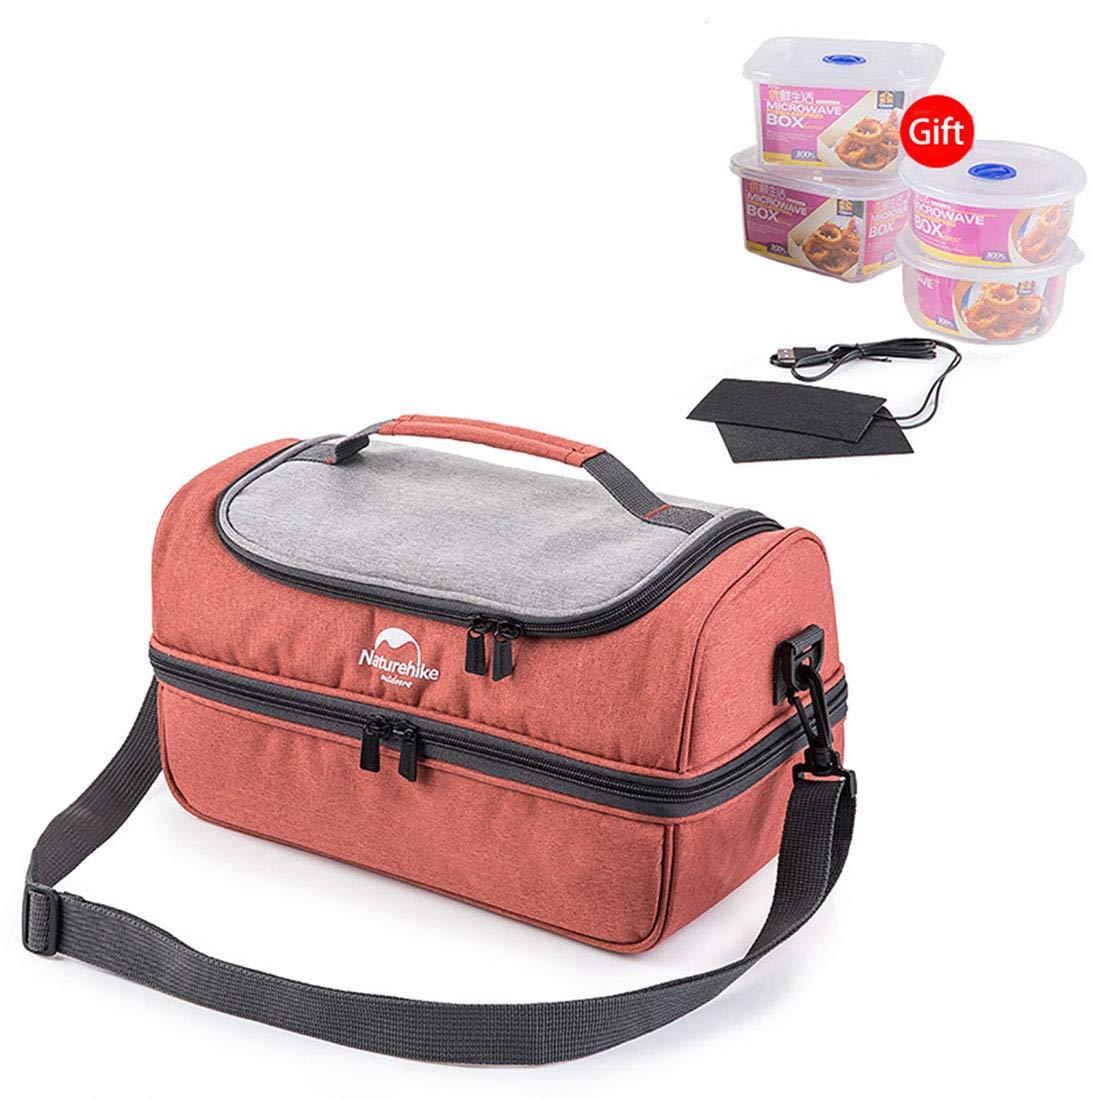 Naturehike exterior alimentos leche térmica preservación caja con aislamiento Cool Picnic bolsas para acampada playa barbacoa, red, M: Amazon.es: Deportes y ...